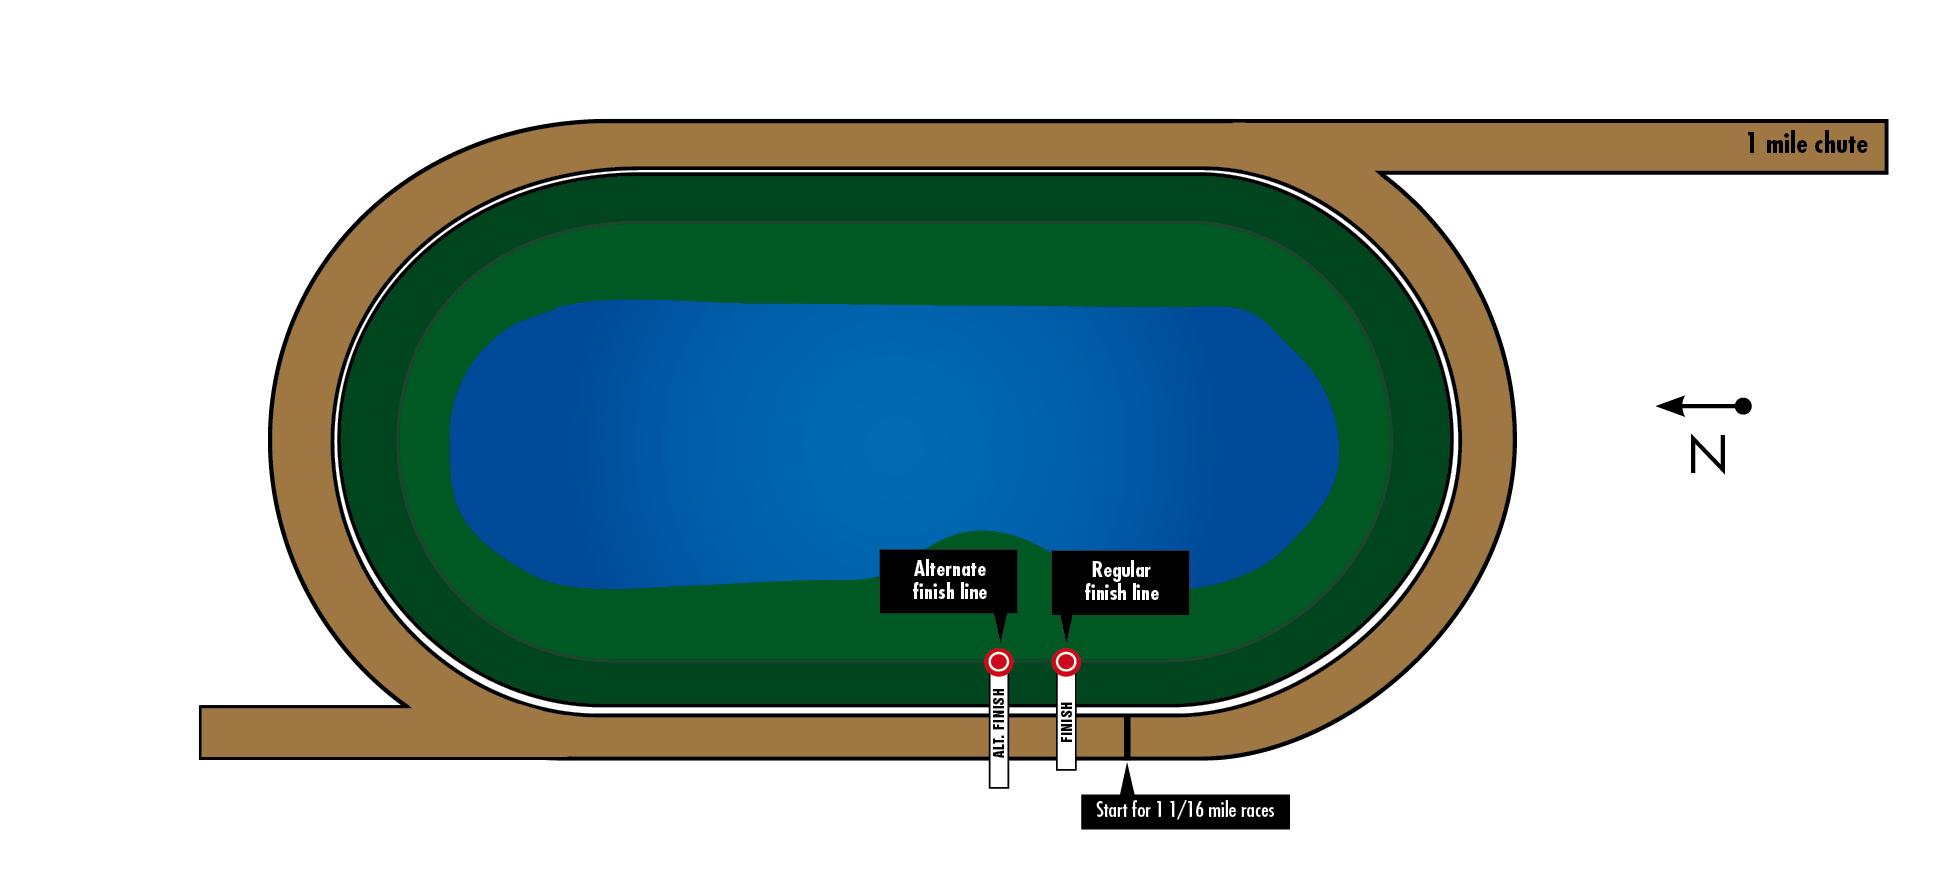 Horse Racing clipart racetrack #10